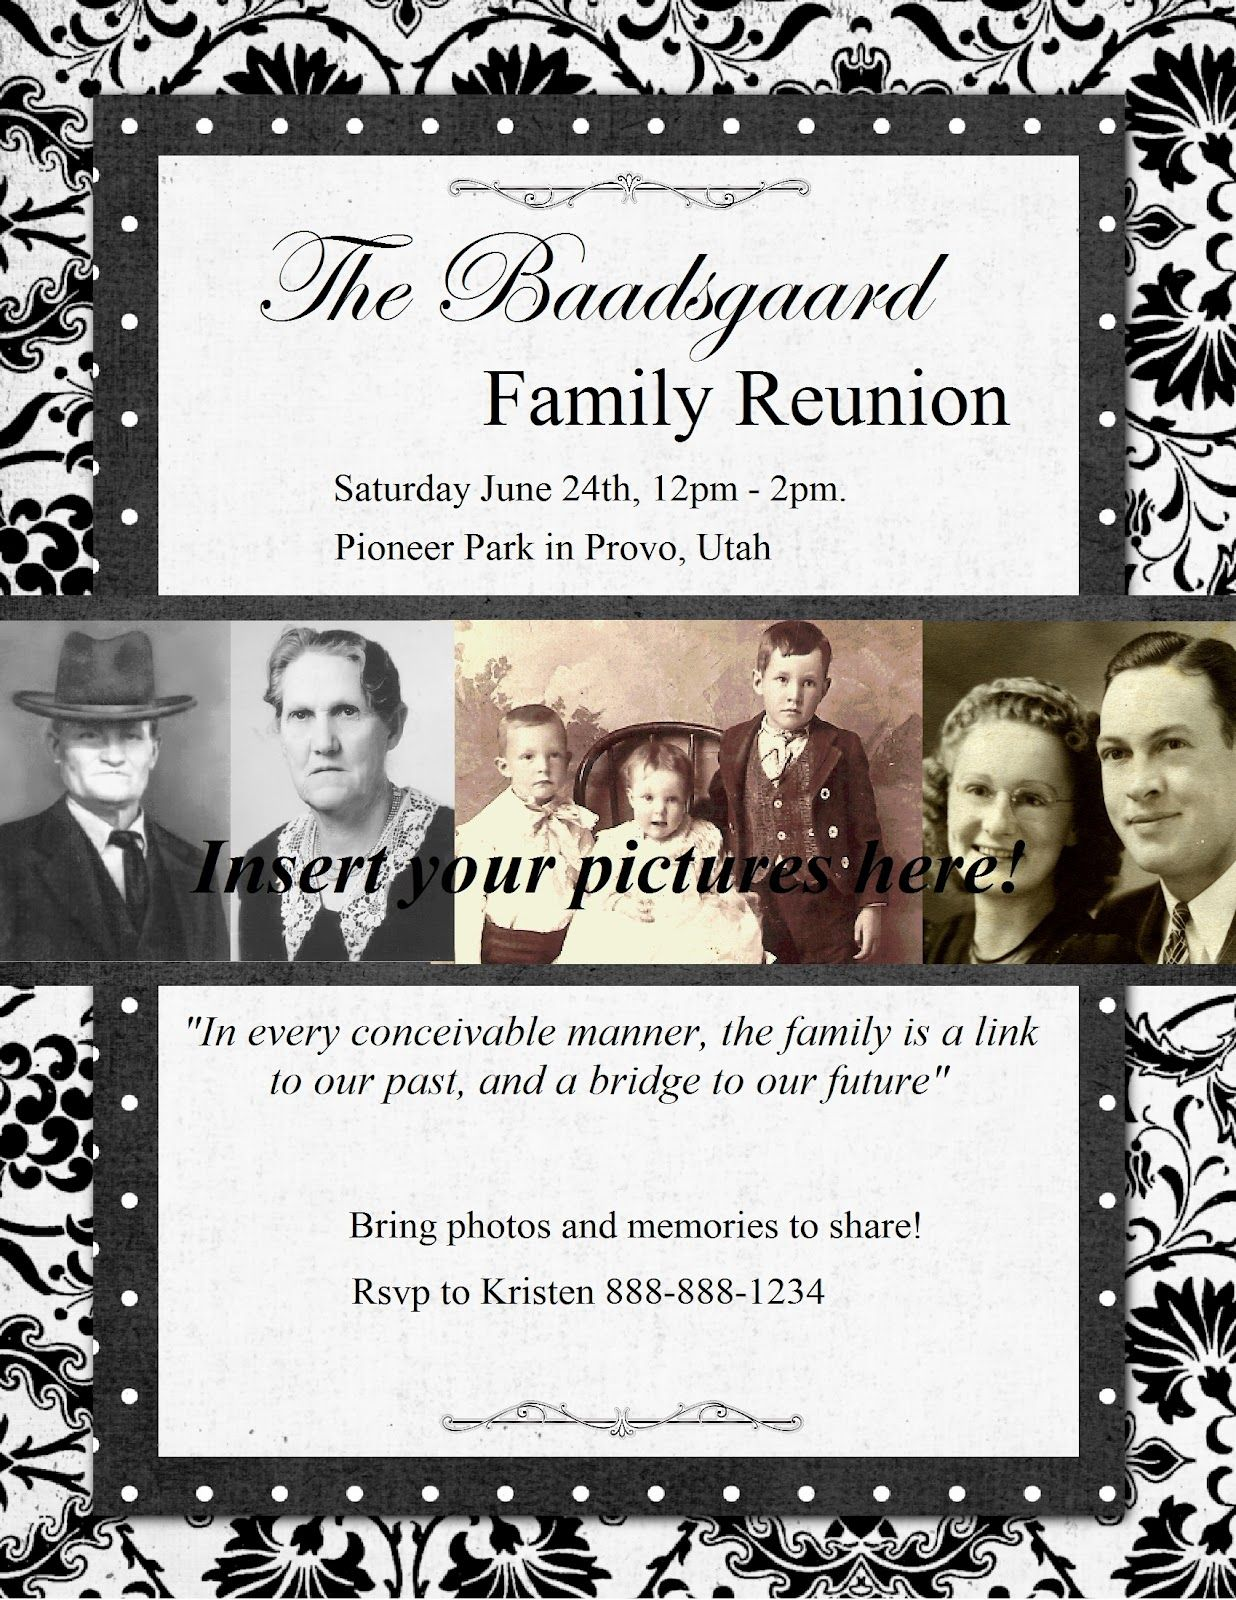 17 Best images about Linn Family Reunion on Pinterest   Reunions ...